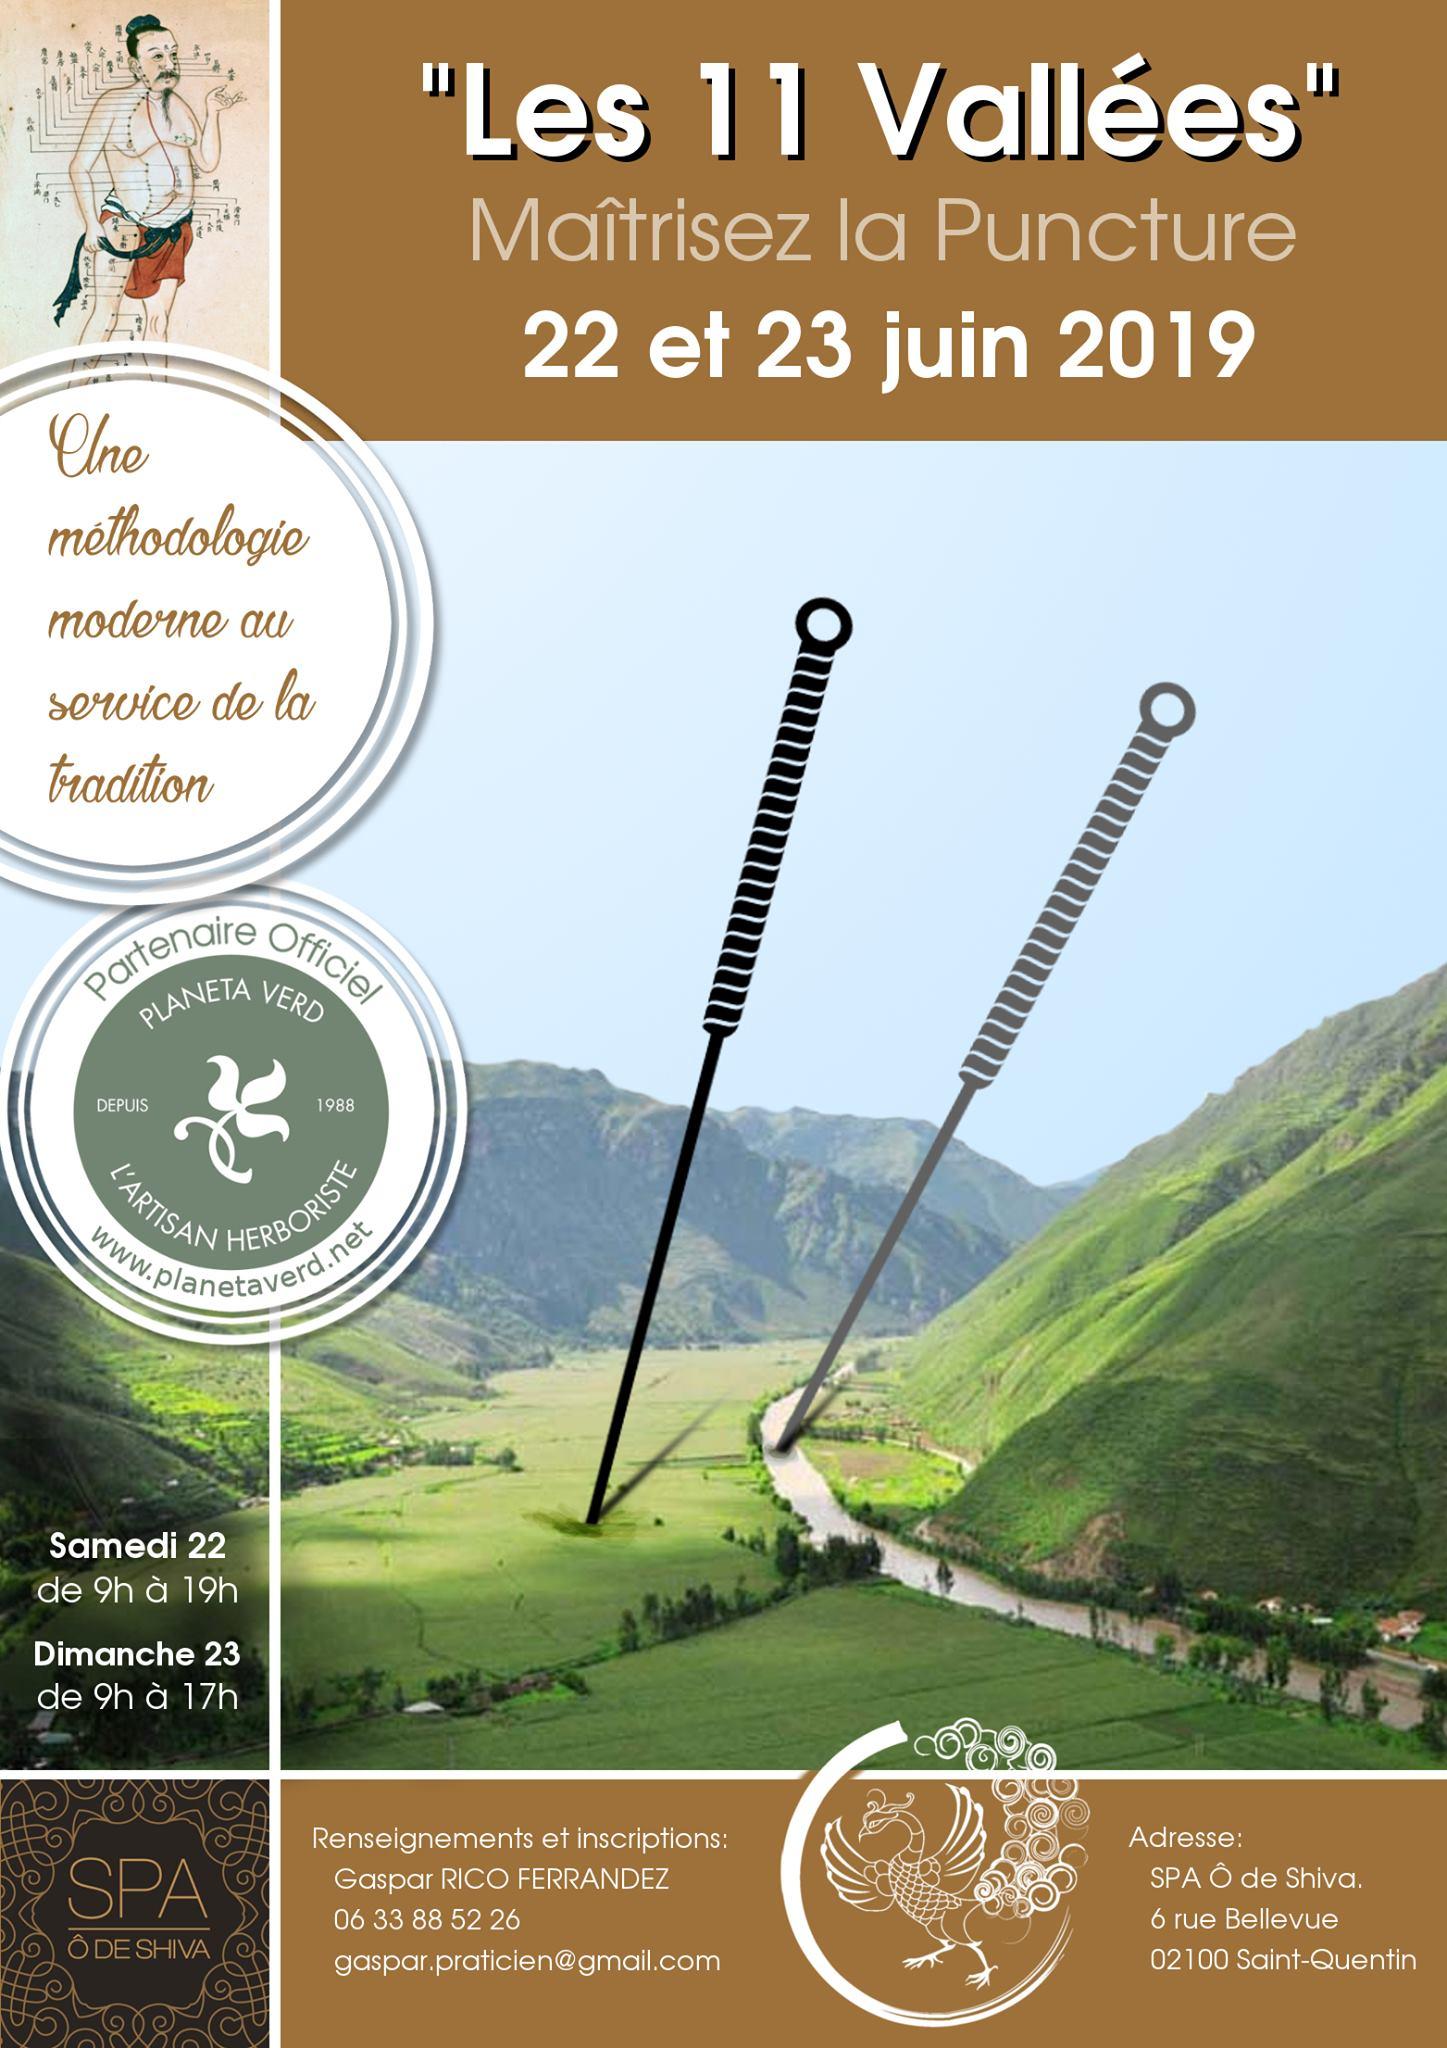 11 vallées 2019 Saint-Quentin